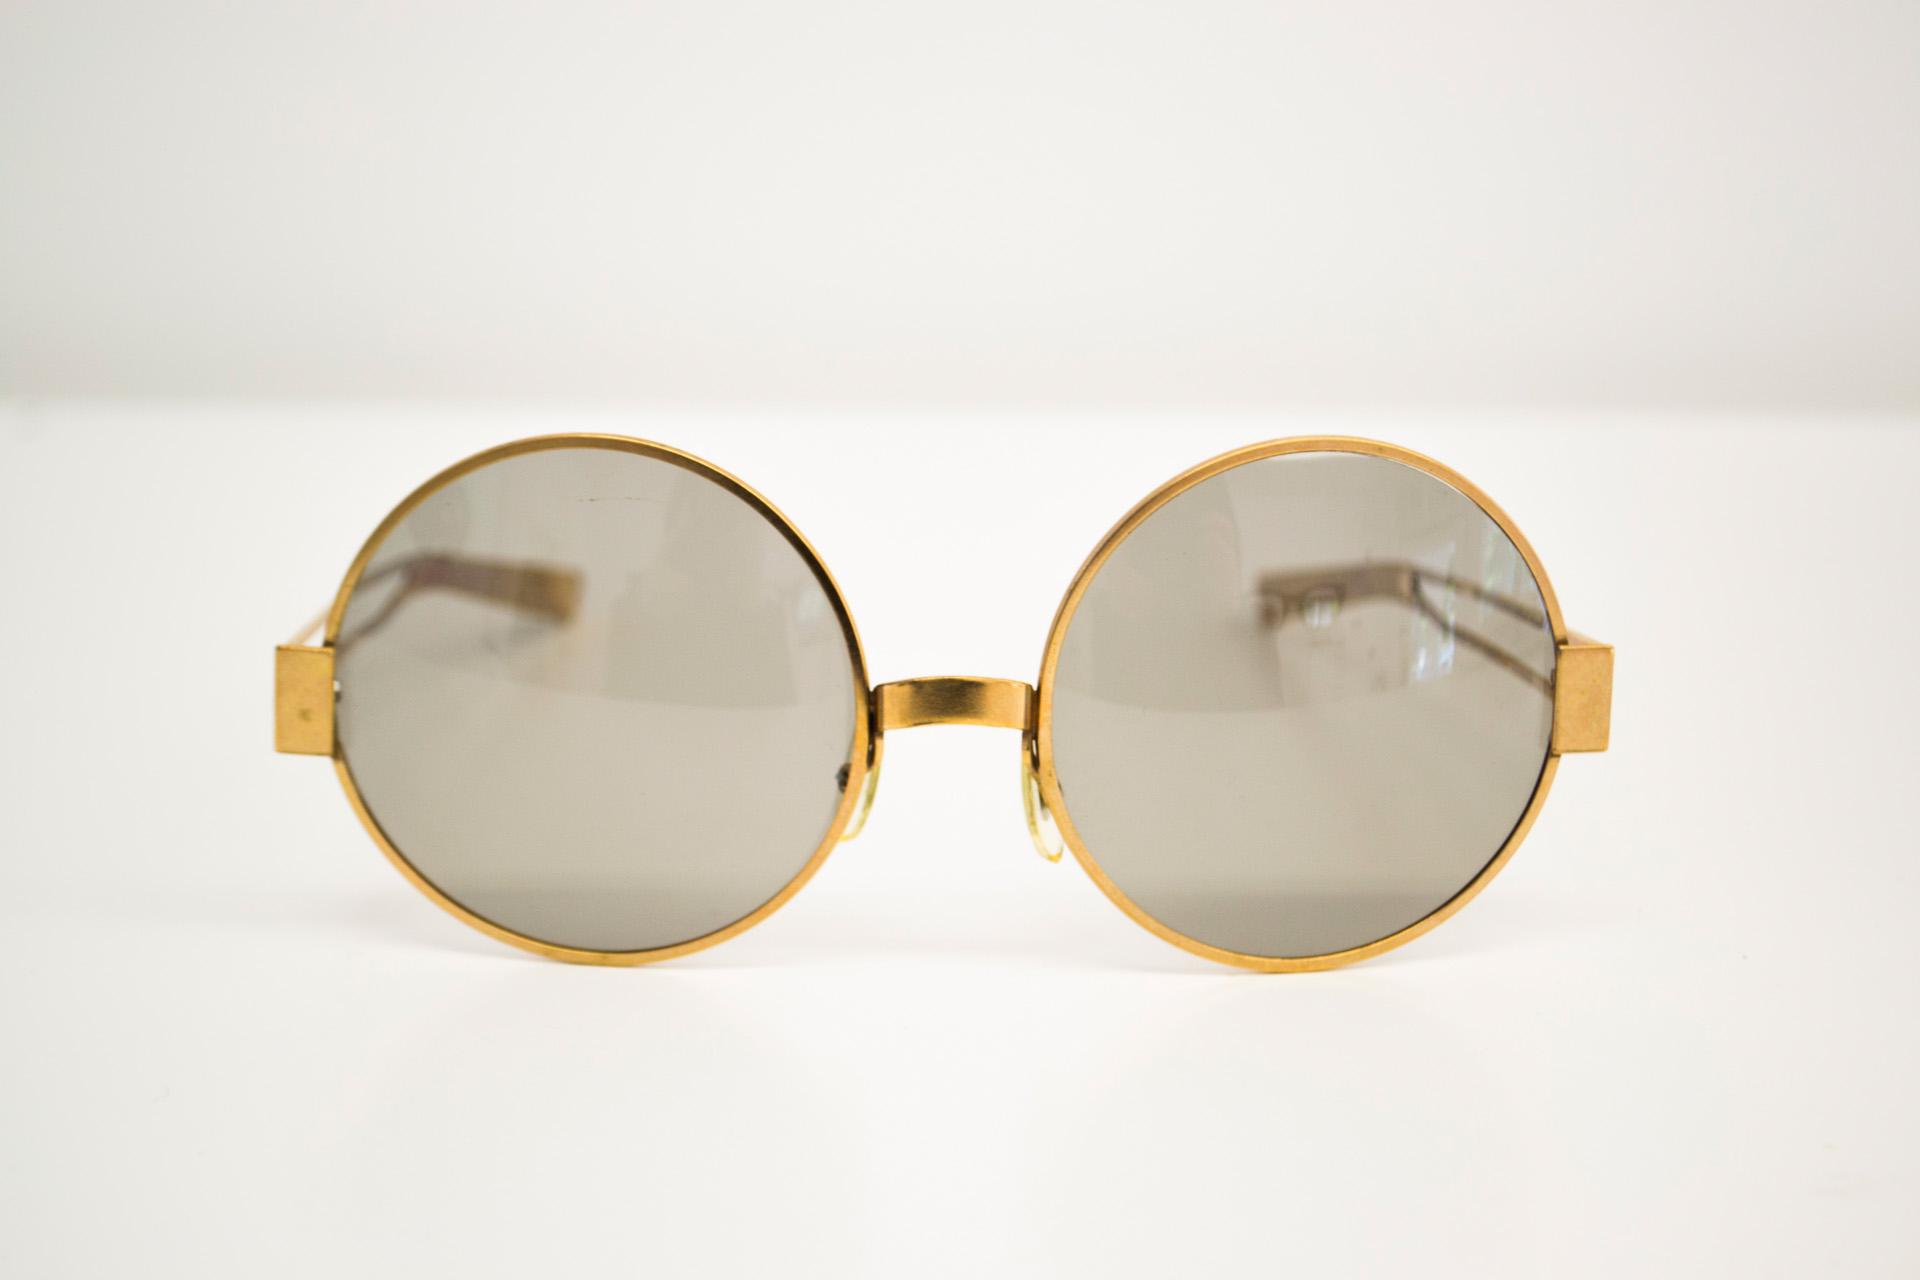 Oleg cassini fashion sunglasses 83